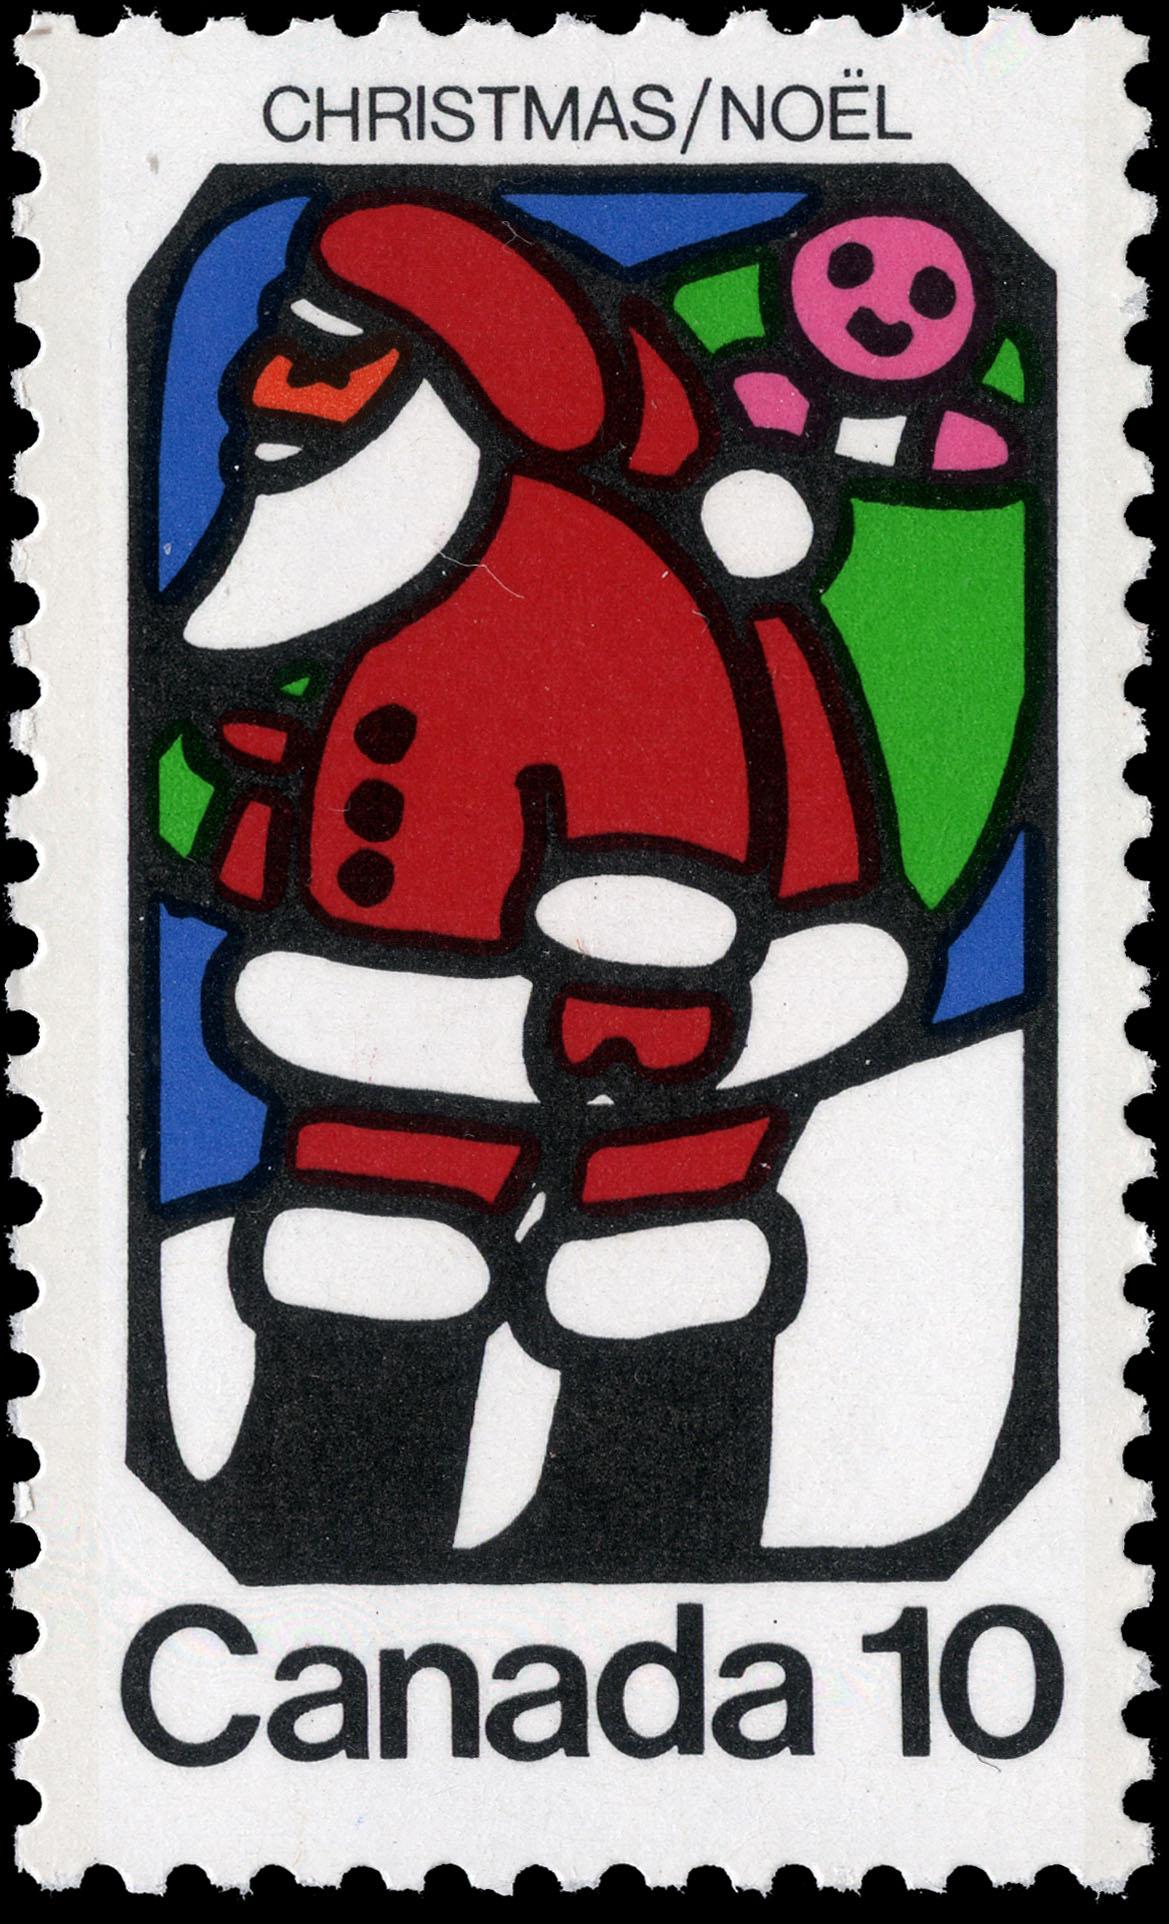 Santa Claus Canada Postage Stamp | Christmas